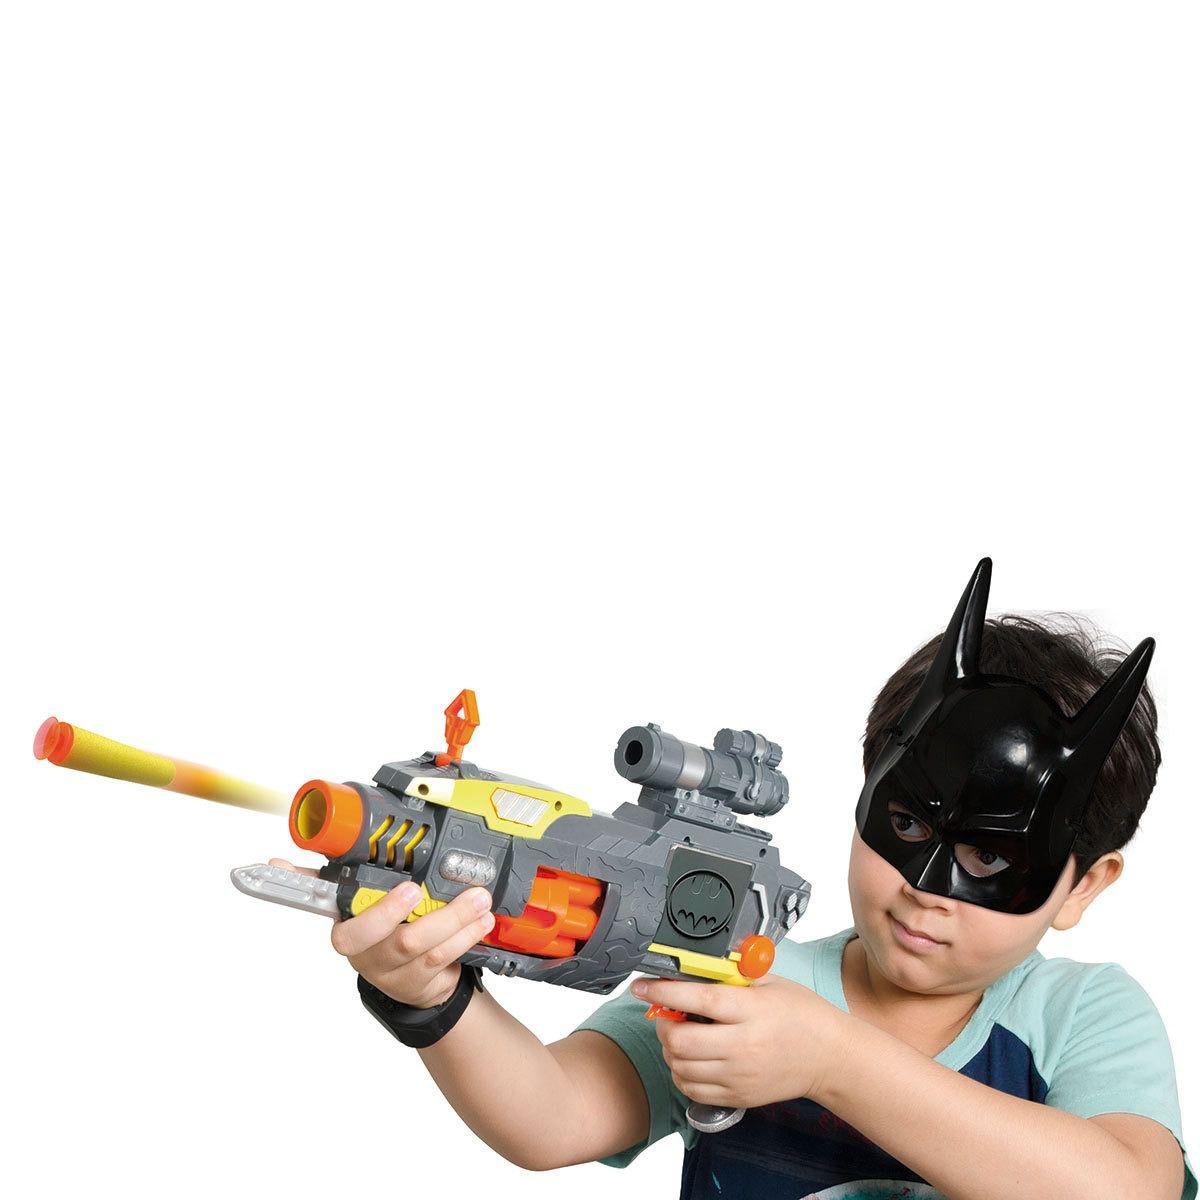 Kit Super Lançador Automático Tambor Giratorio E Máscara Batman - Rosita  - Doce Diversão